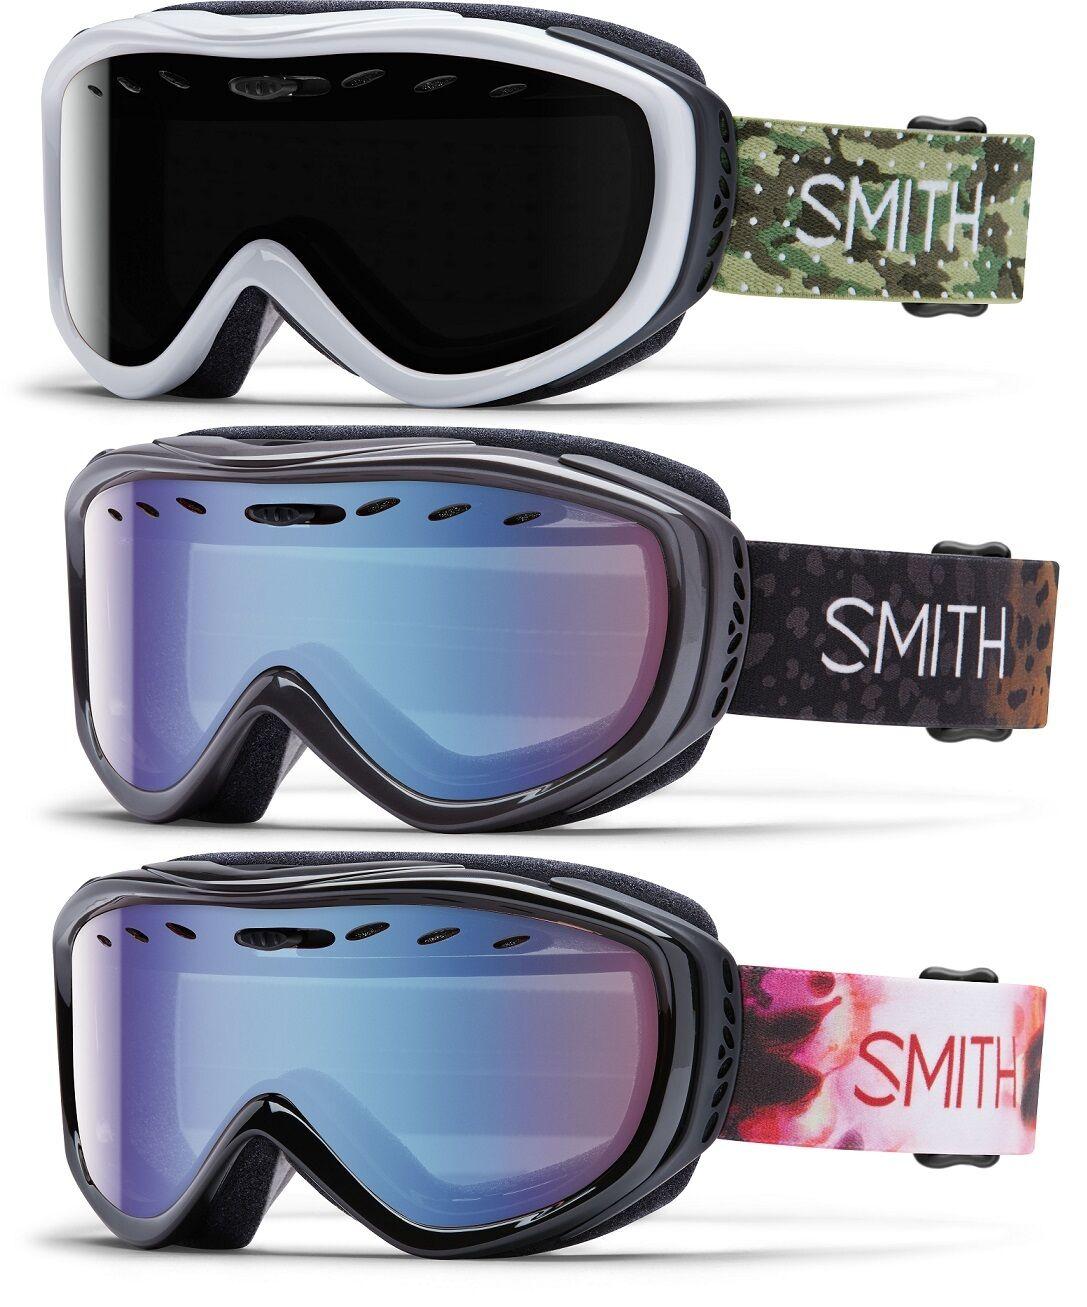 Smith Optics Cadence Snowboard   Ski Goggles, Many colors, Brand New,SALE